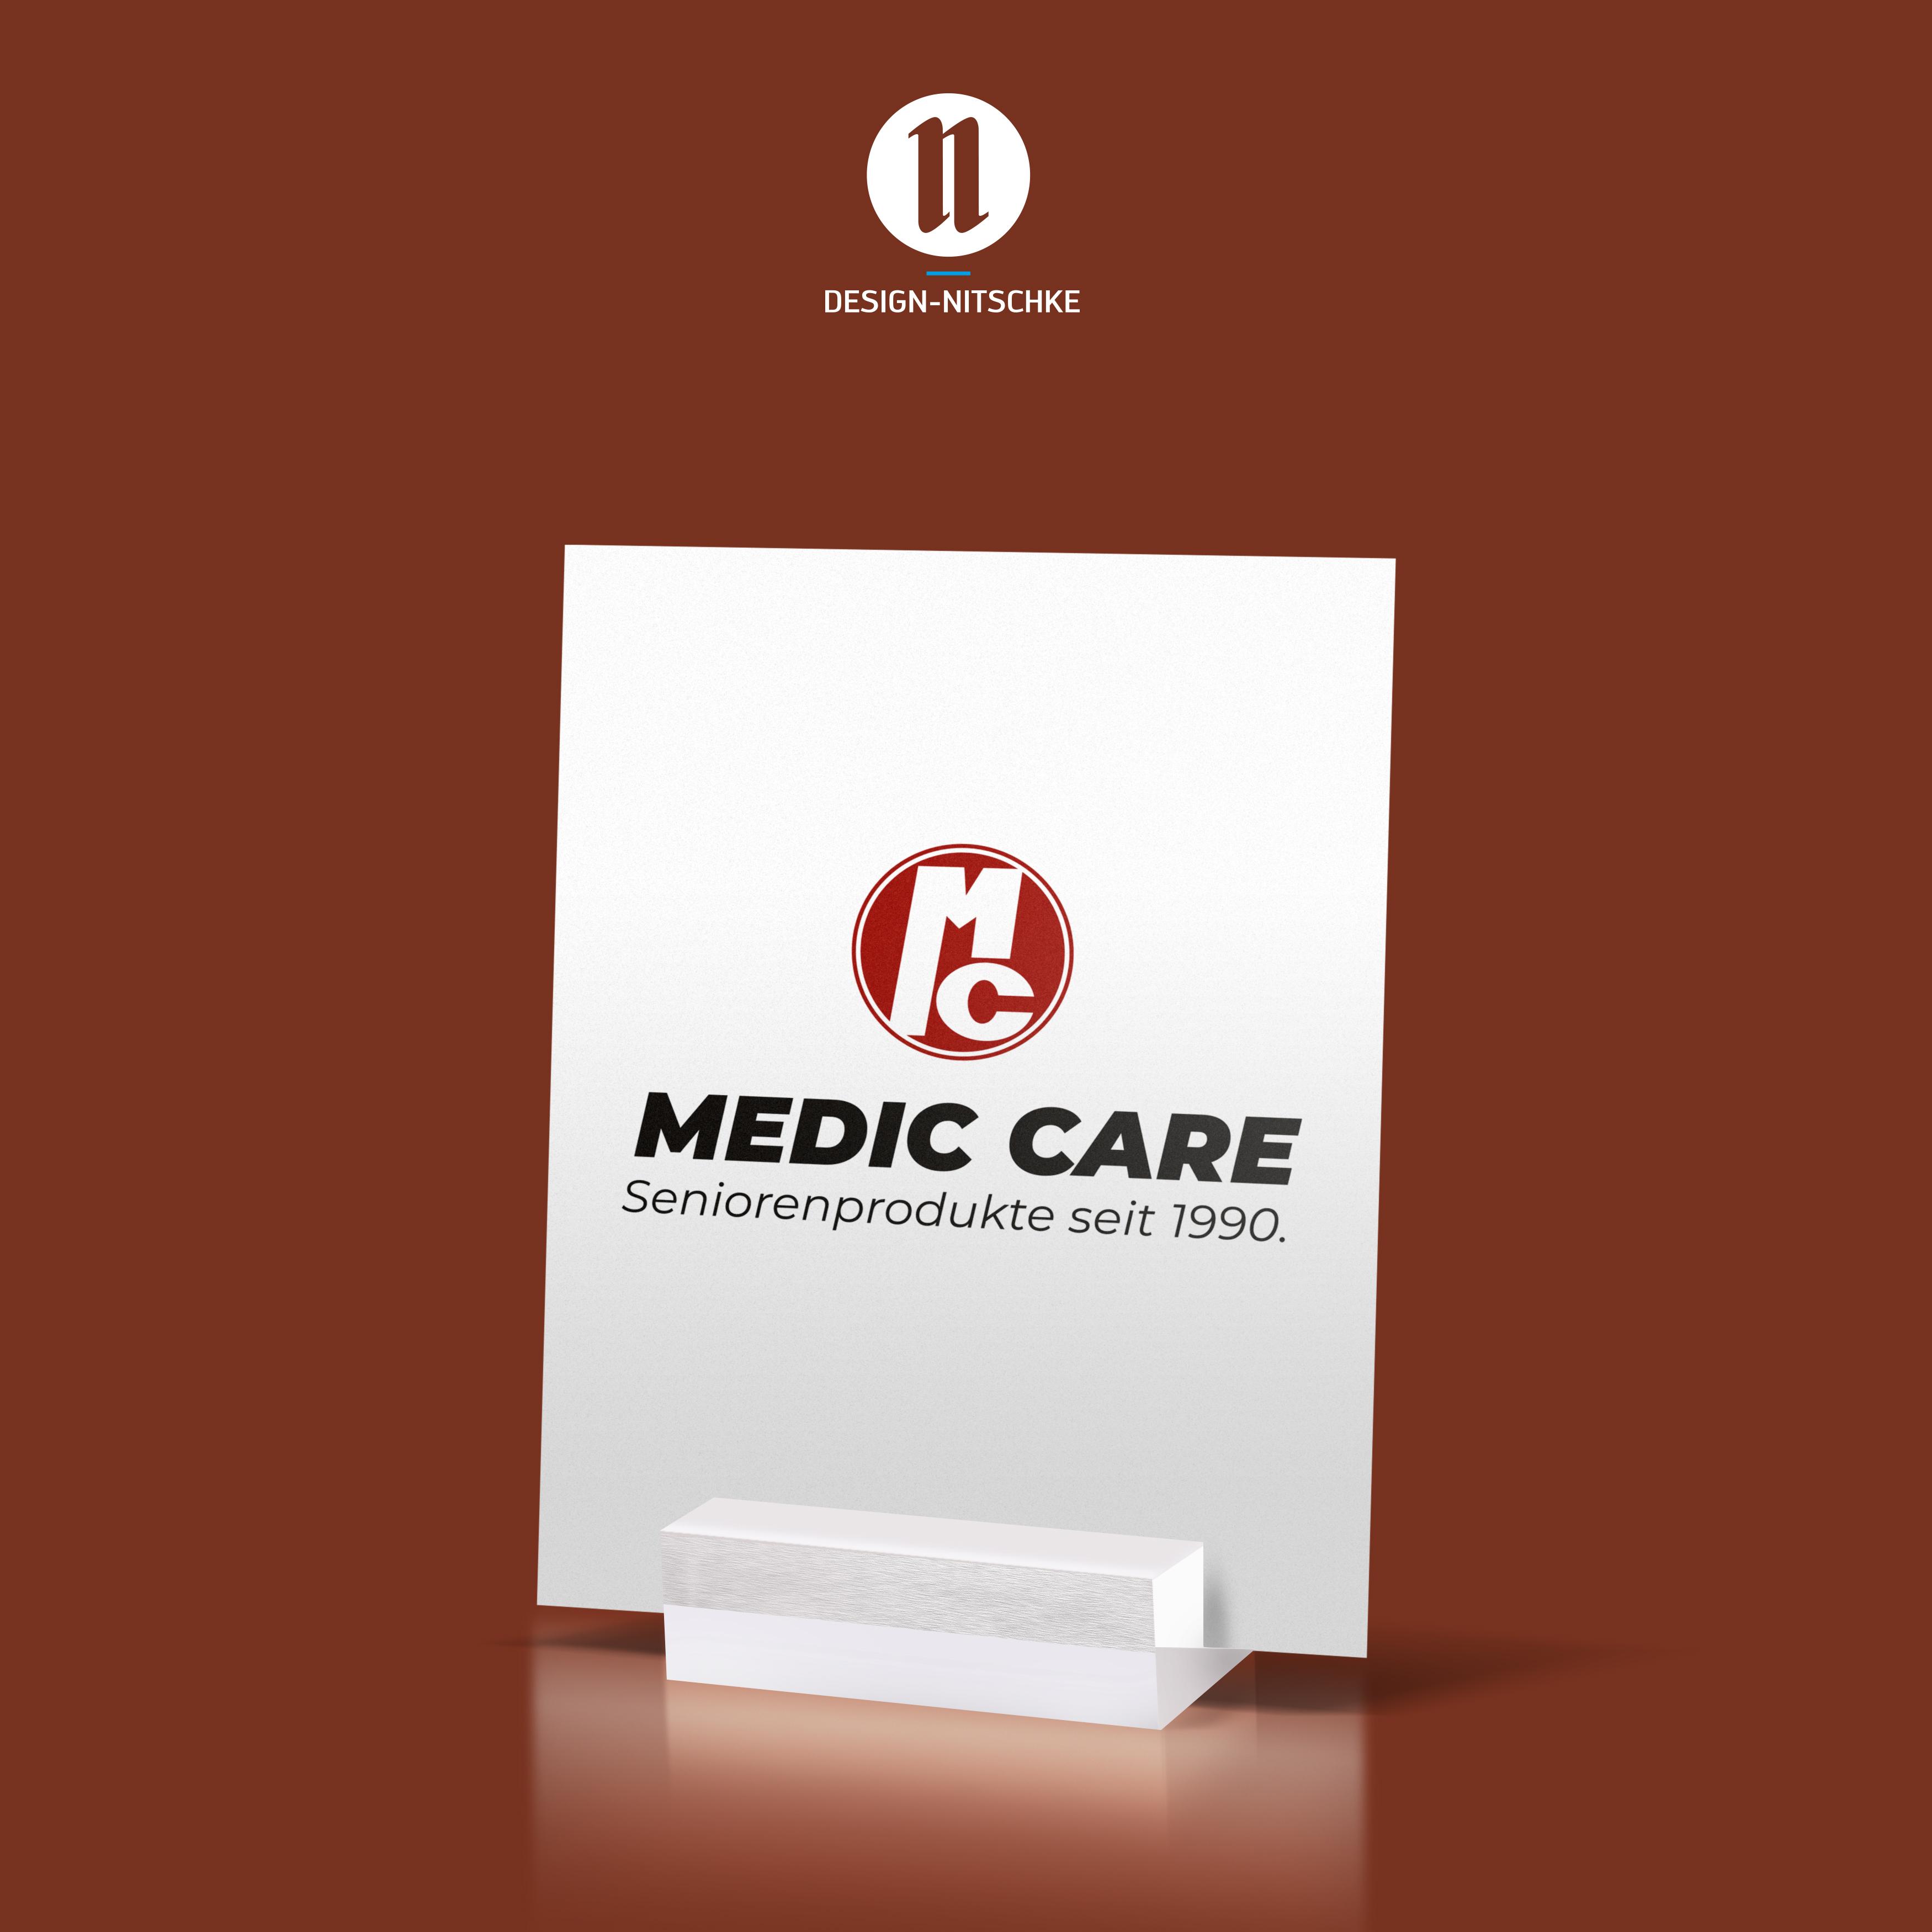 medic_care_seniorenprodukte_logo_ci_redesign_nitschke_werbeagentur_rot_oranienburg.jpg